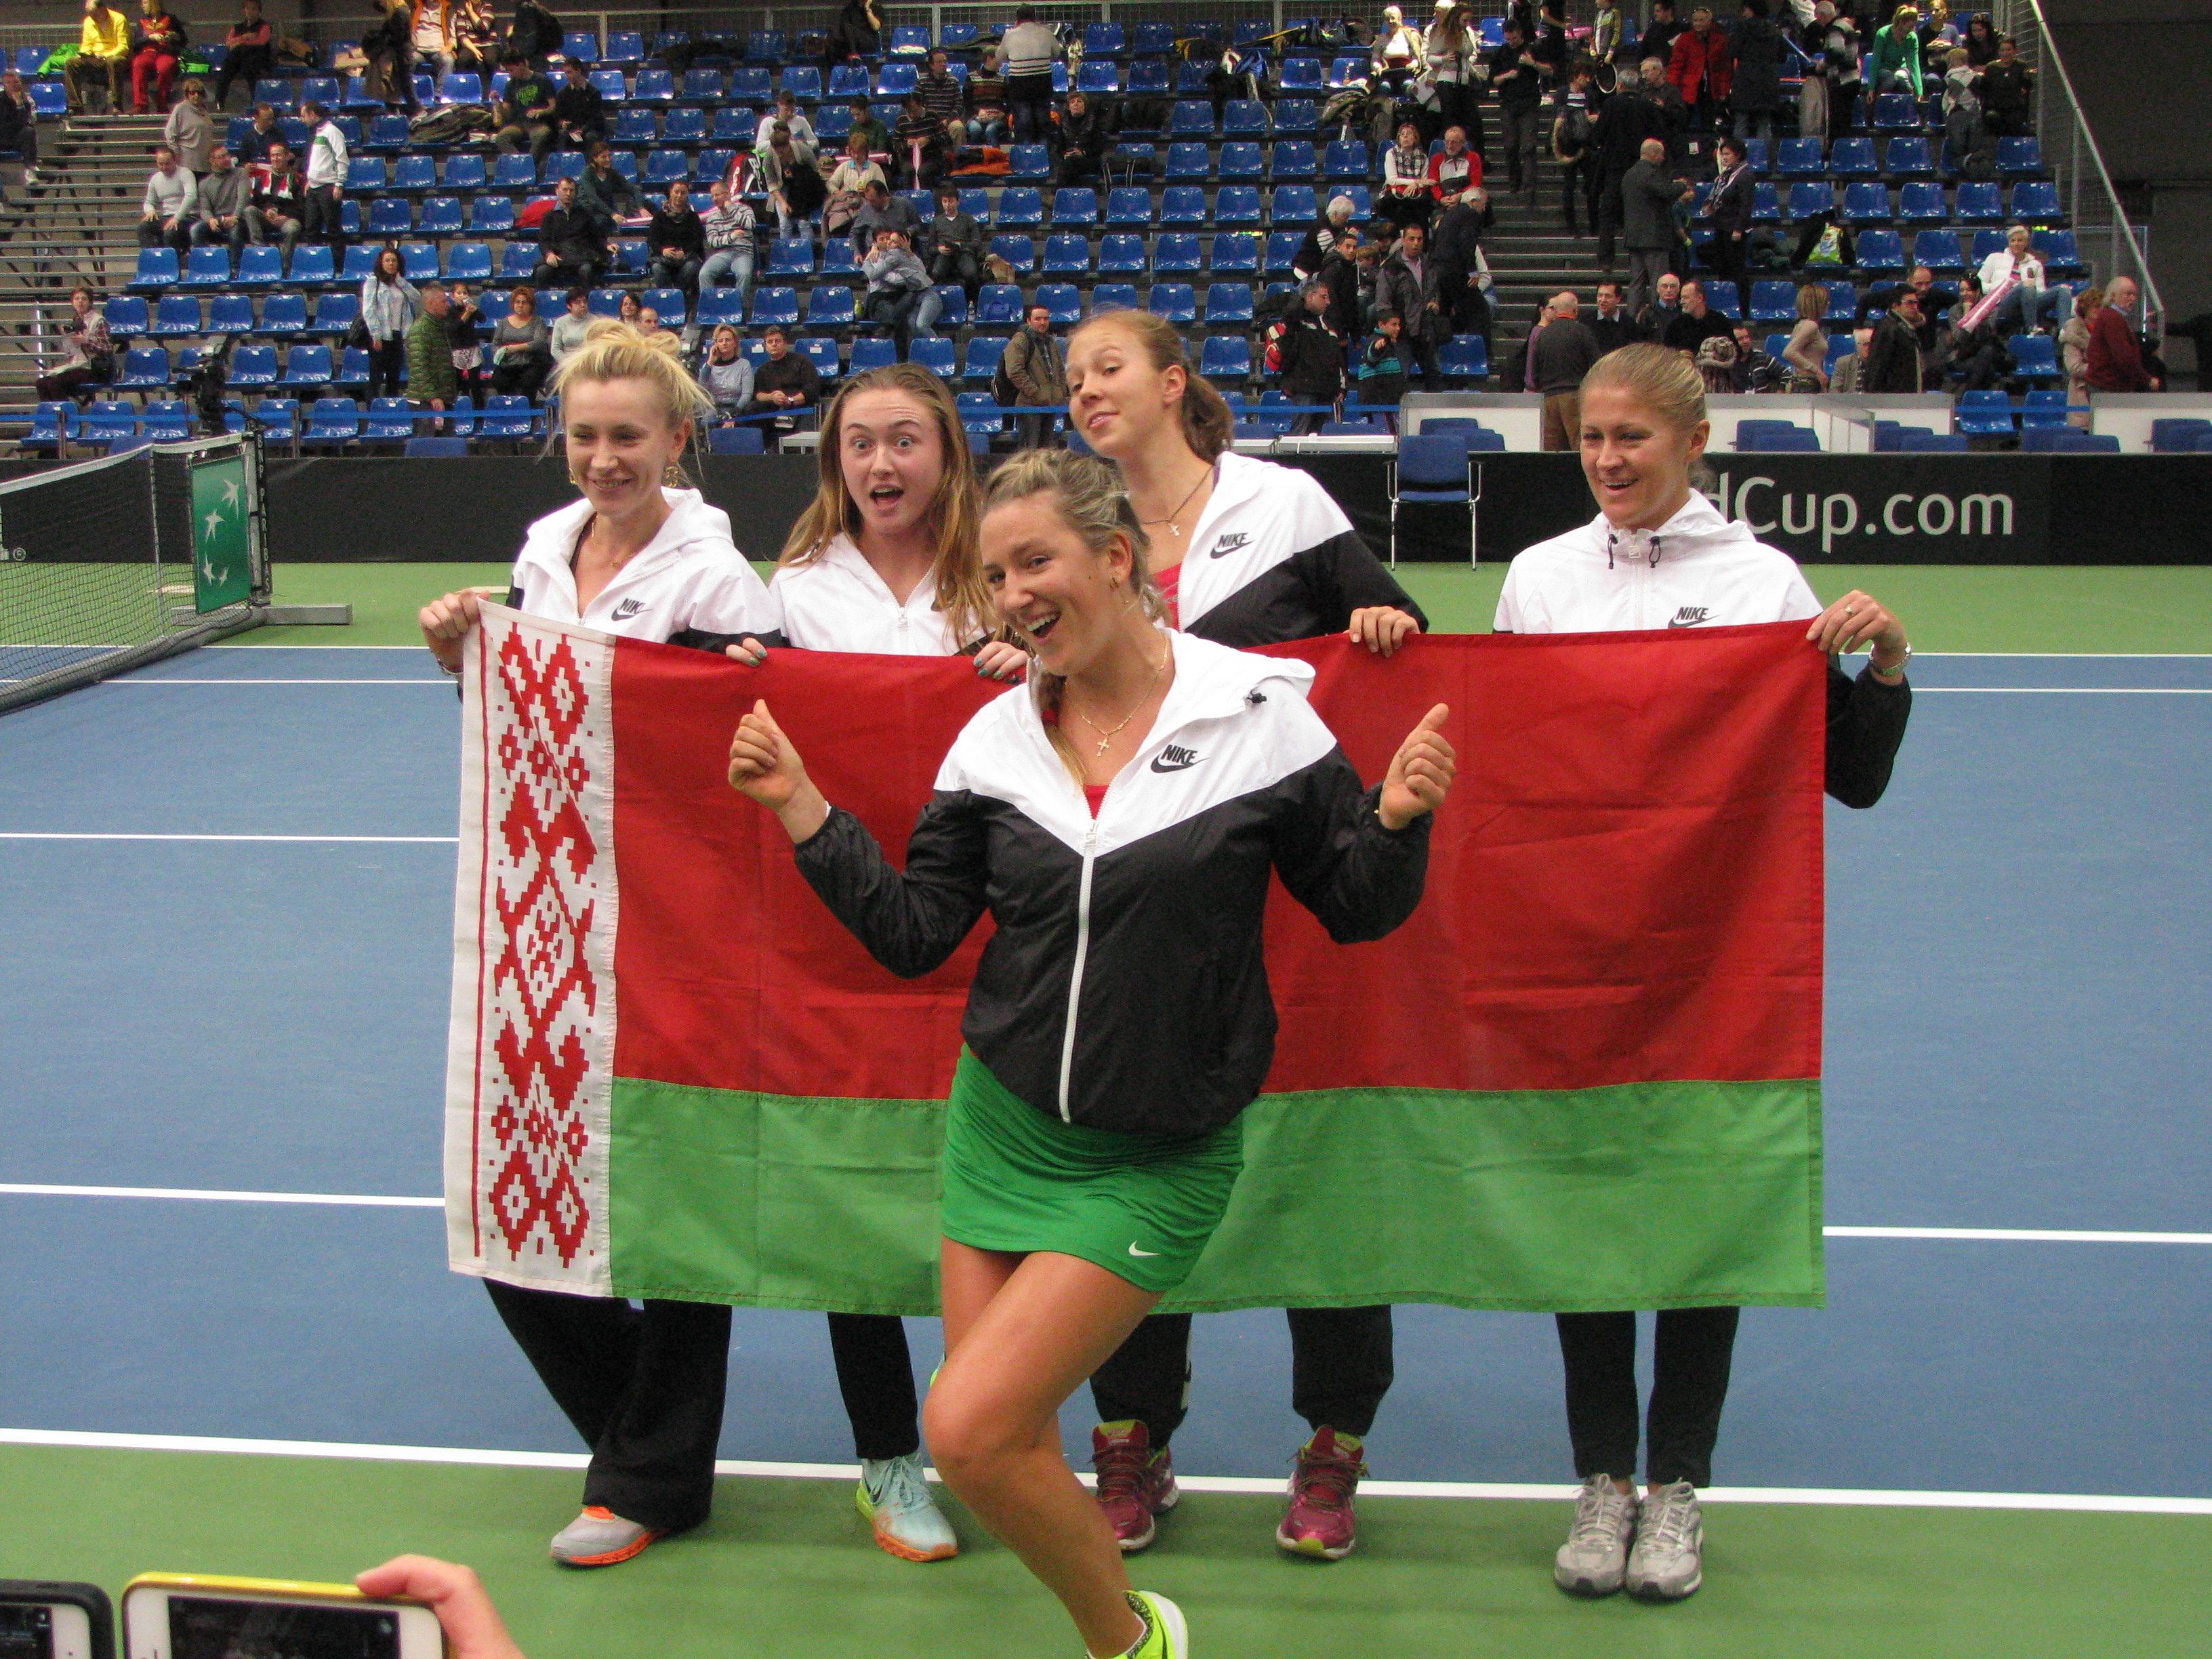 Сборная Беларуси по теннису на Кубке мира в Будапеште